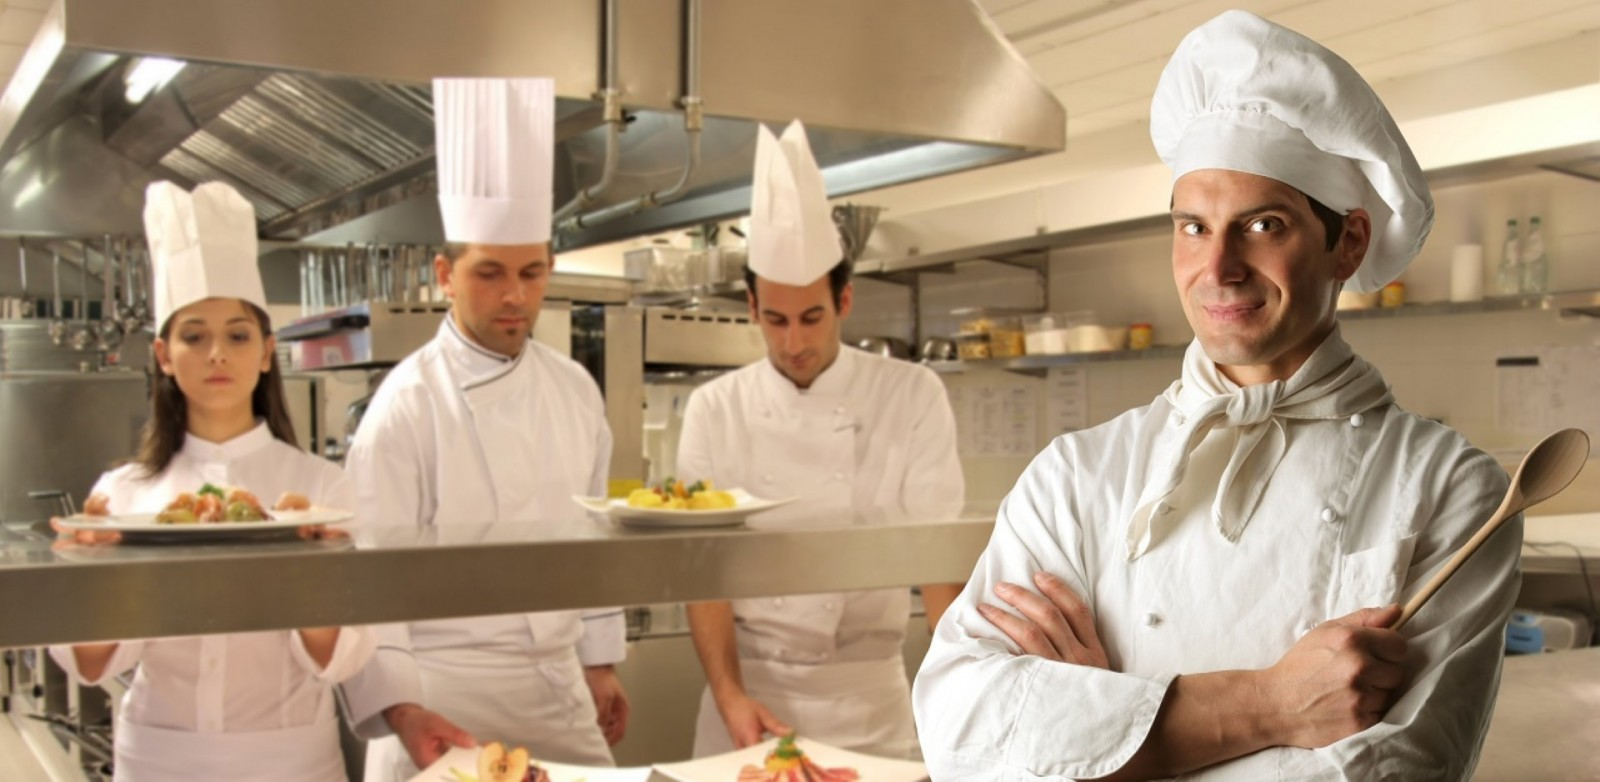 cuisinier  u00e9re  de collectivit u00e9  u2013 breizh emploi 56